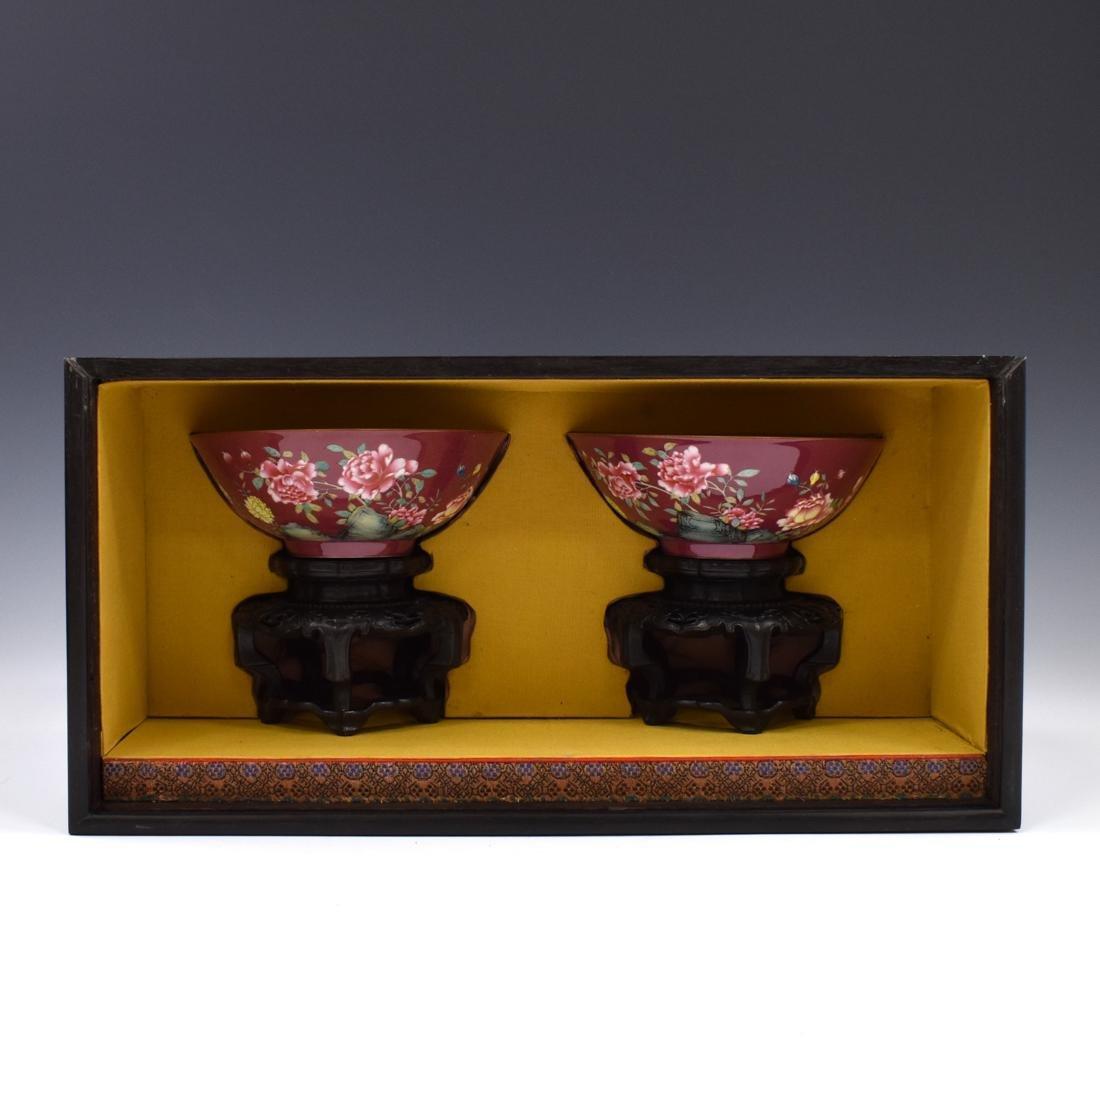 PAIR OF YONGZHENG ENAMEL RUBY RED BOWLS IN BOX